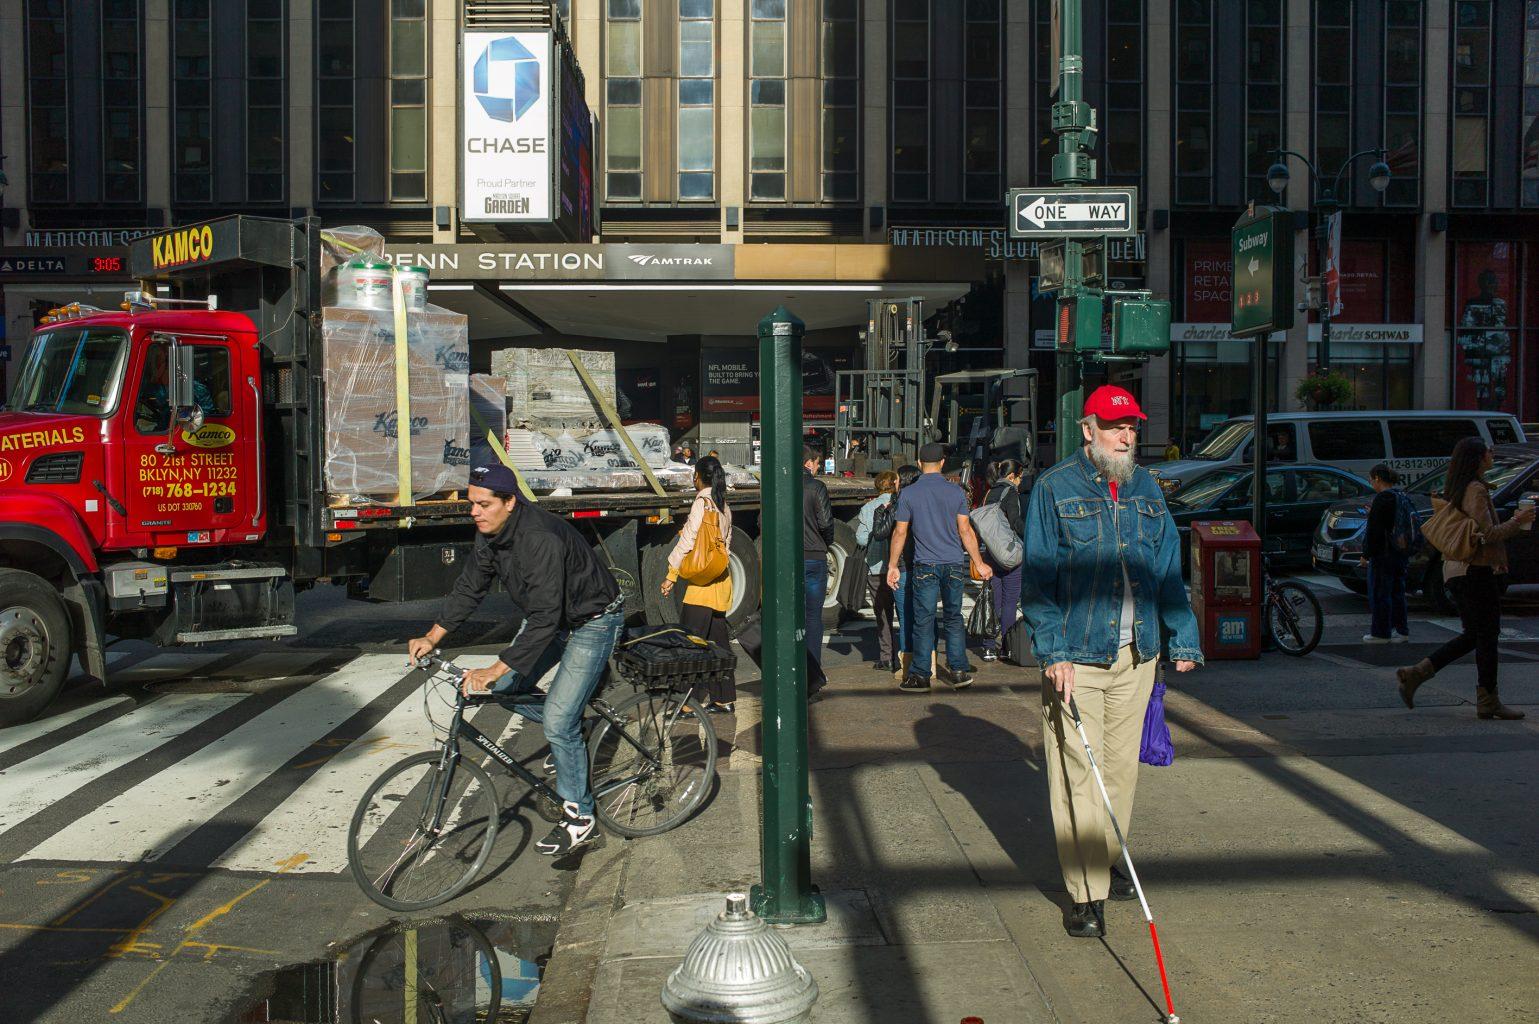 City Colour IV, Penn Station, New York City, 8. Oktober 2012